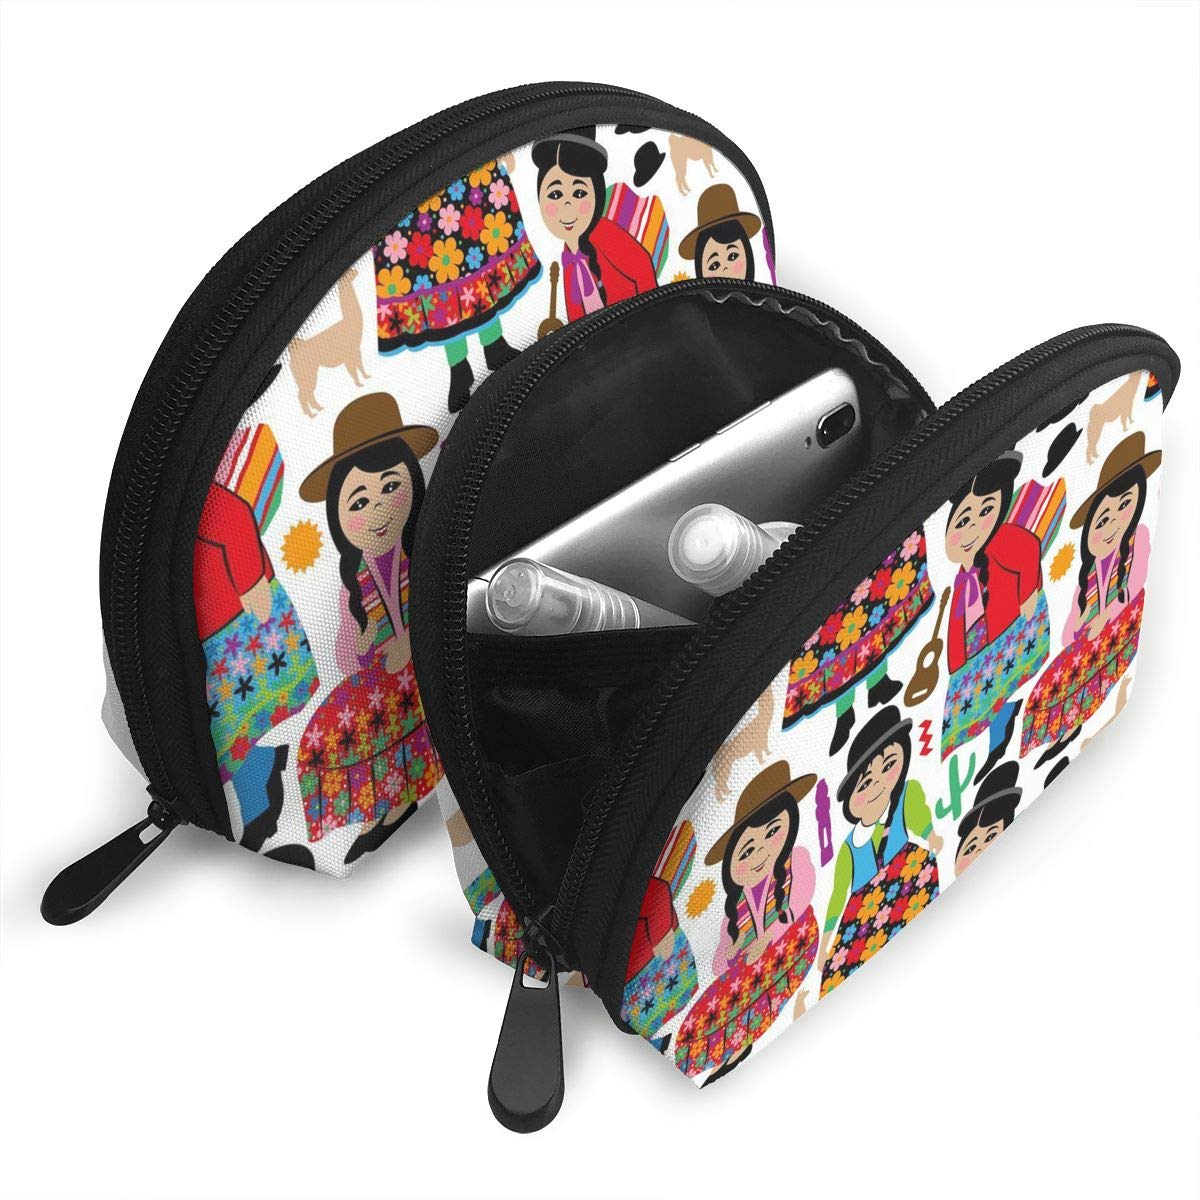 0579a2823aa6 Amazon.com: JDISJLJ Cosmetic Travel Bag Bolivian Girls Shell ...